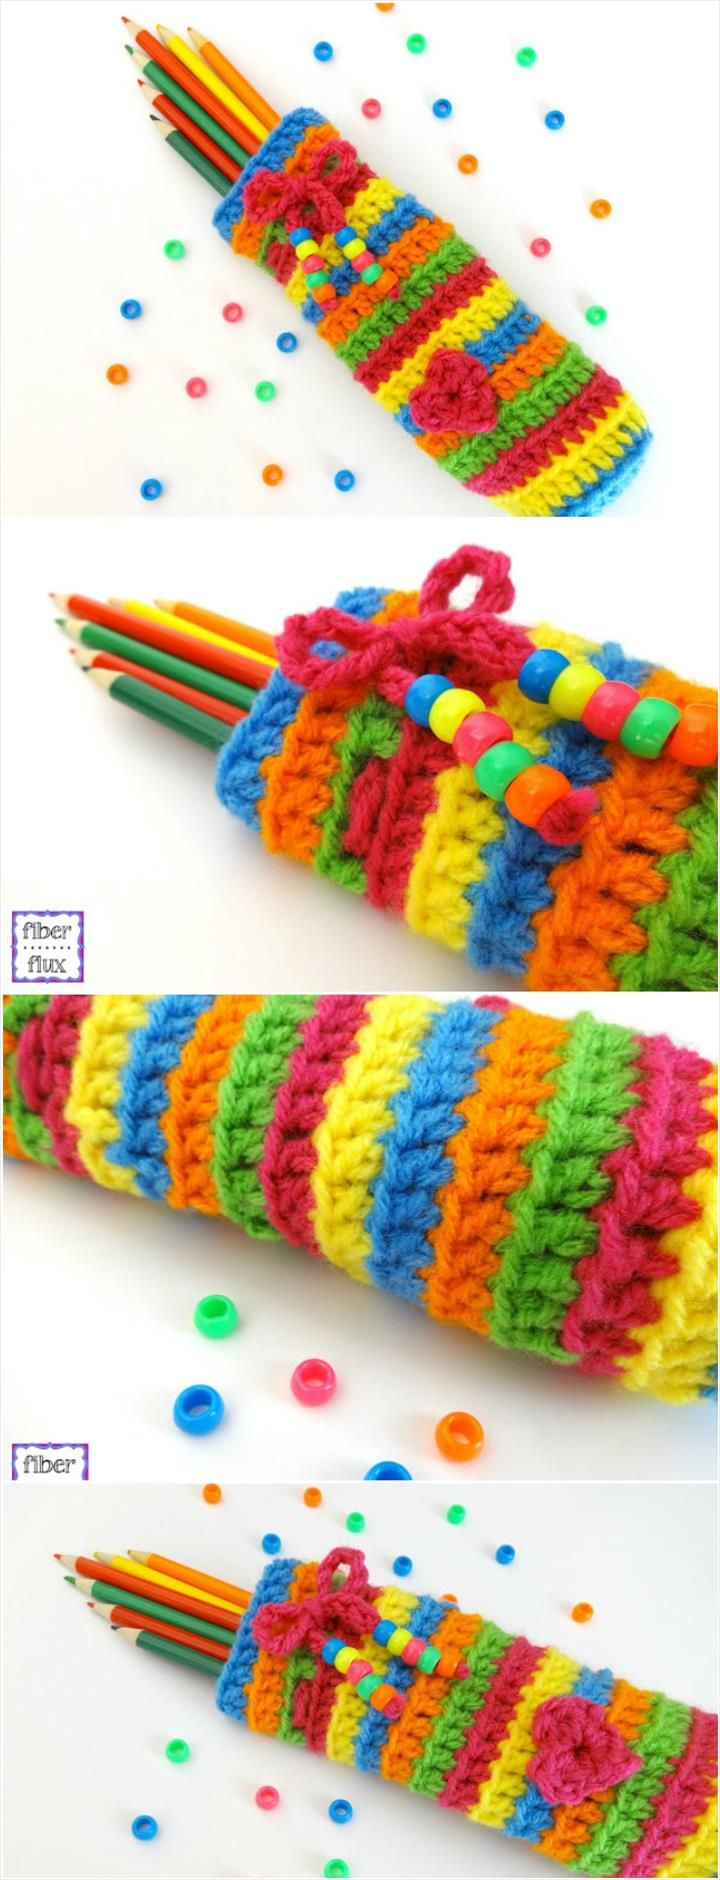 101 Free Crochet Patterns Full Instructions For Beginners